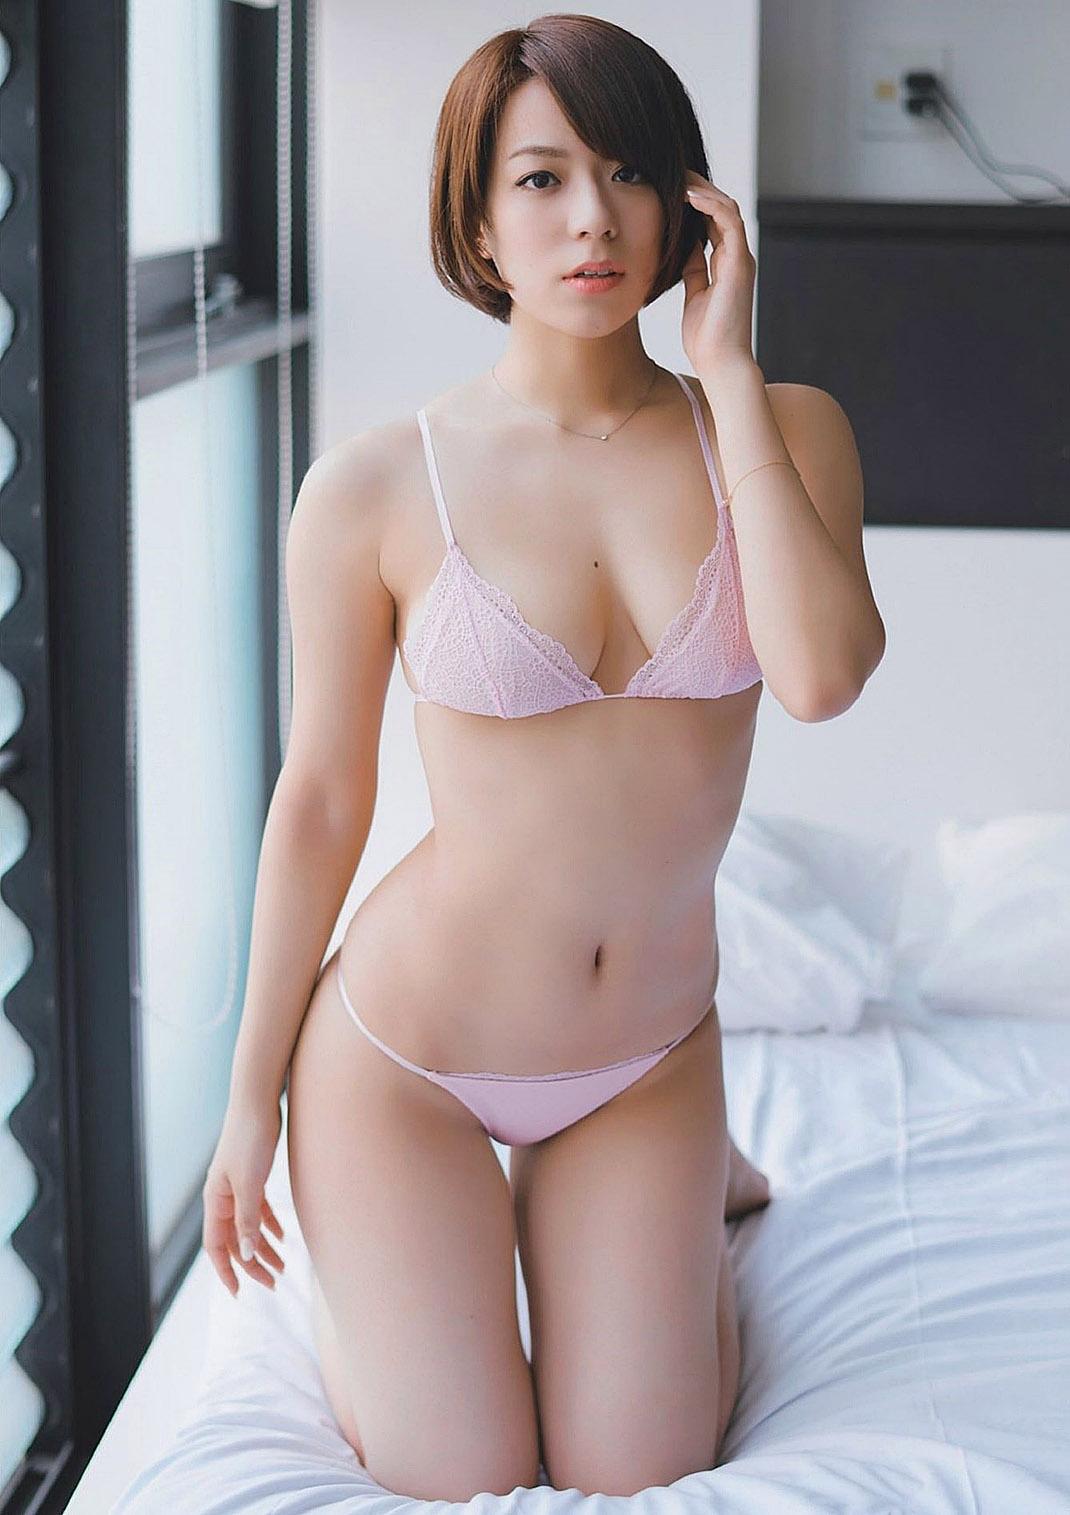 Mayu Koseta Girls 3 2019 03.jpg